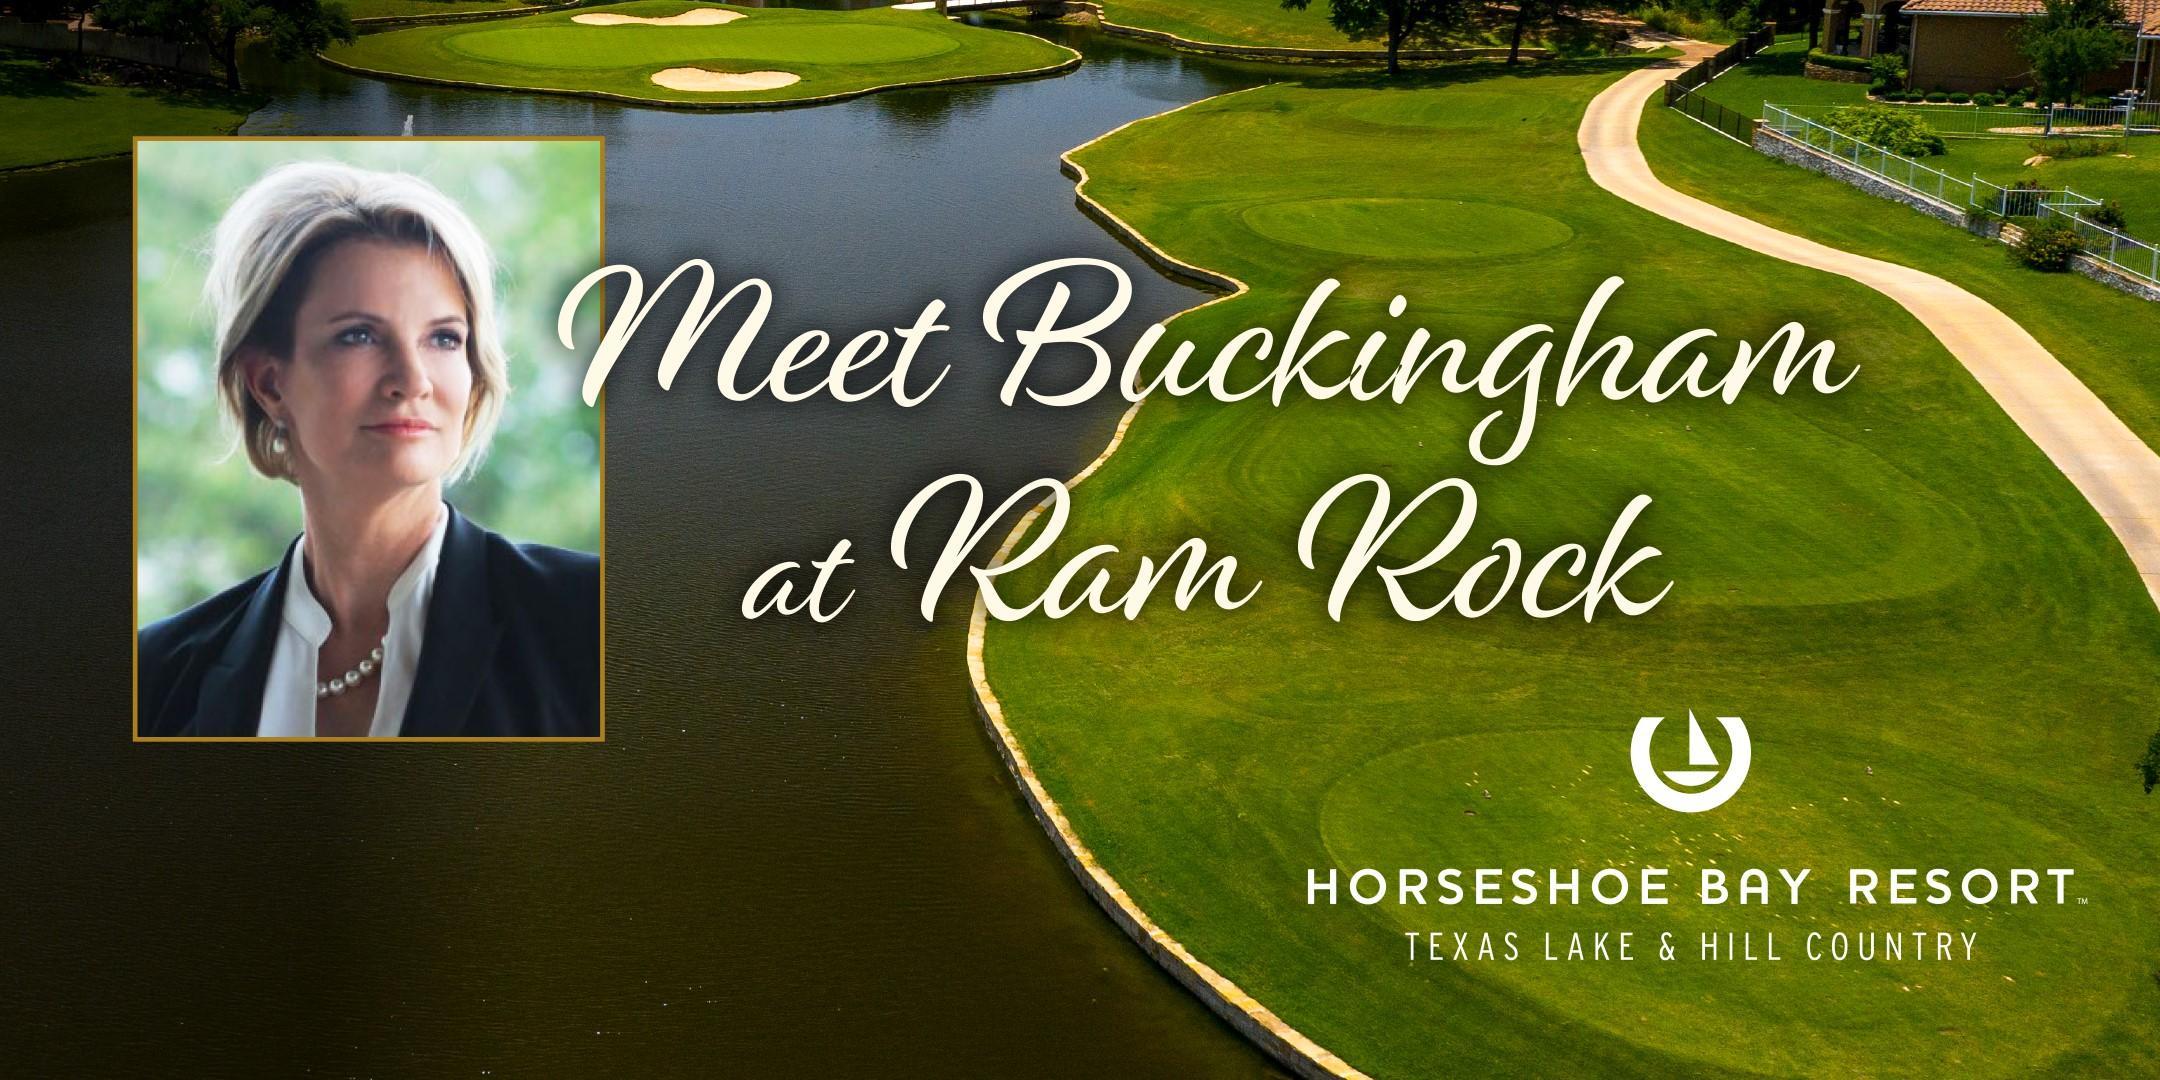 Buckingham Golf Tournament and Reception at Ram Rock - Horseshoe Bay Resort